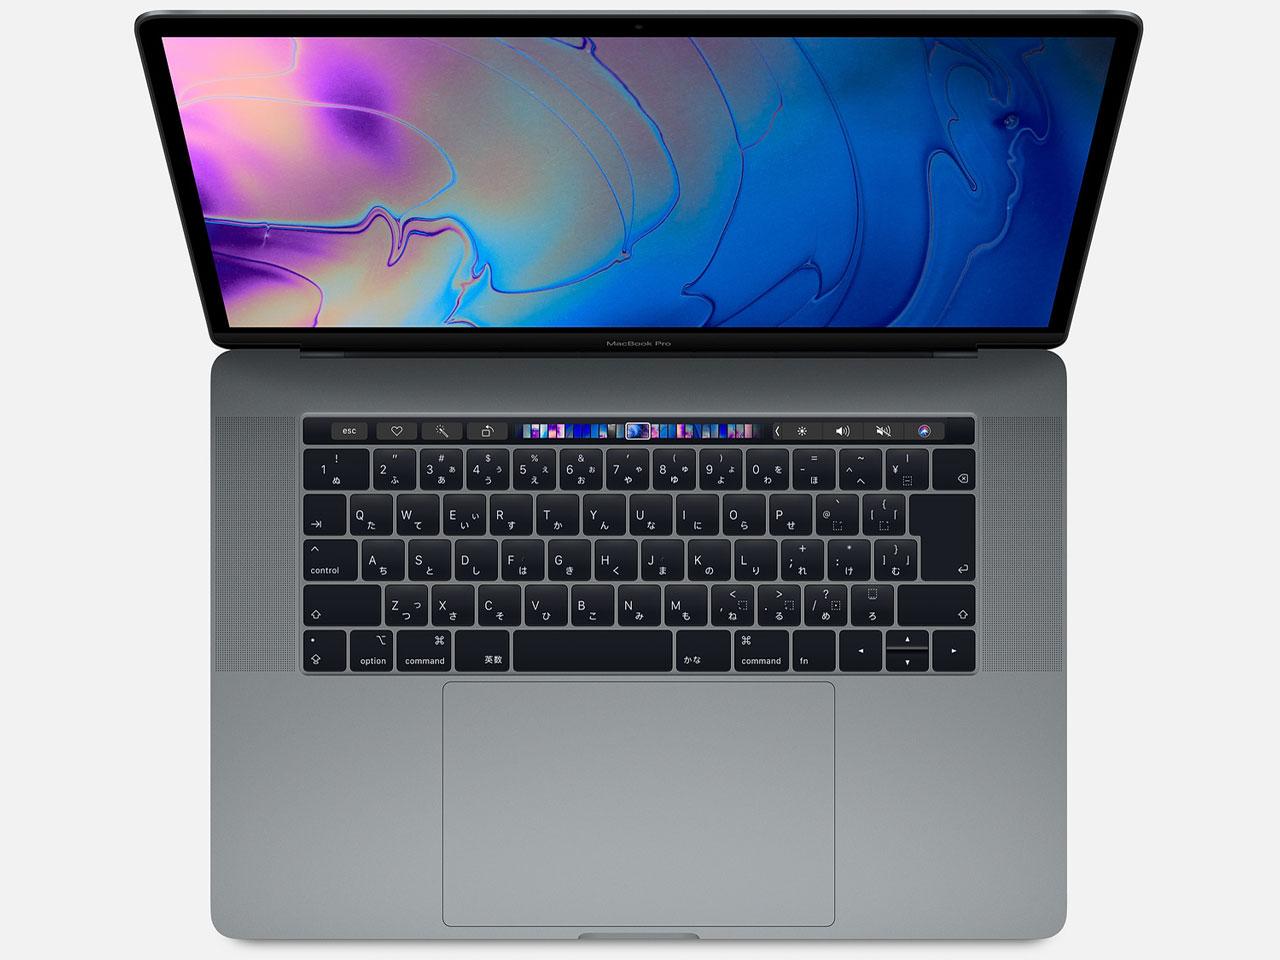 MacBook Pro (15-inch, 2018) MR932J/A スペースグレイ